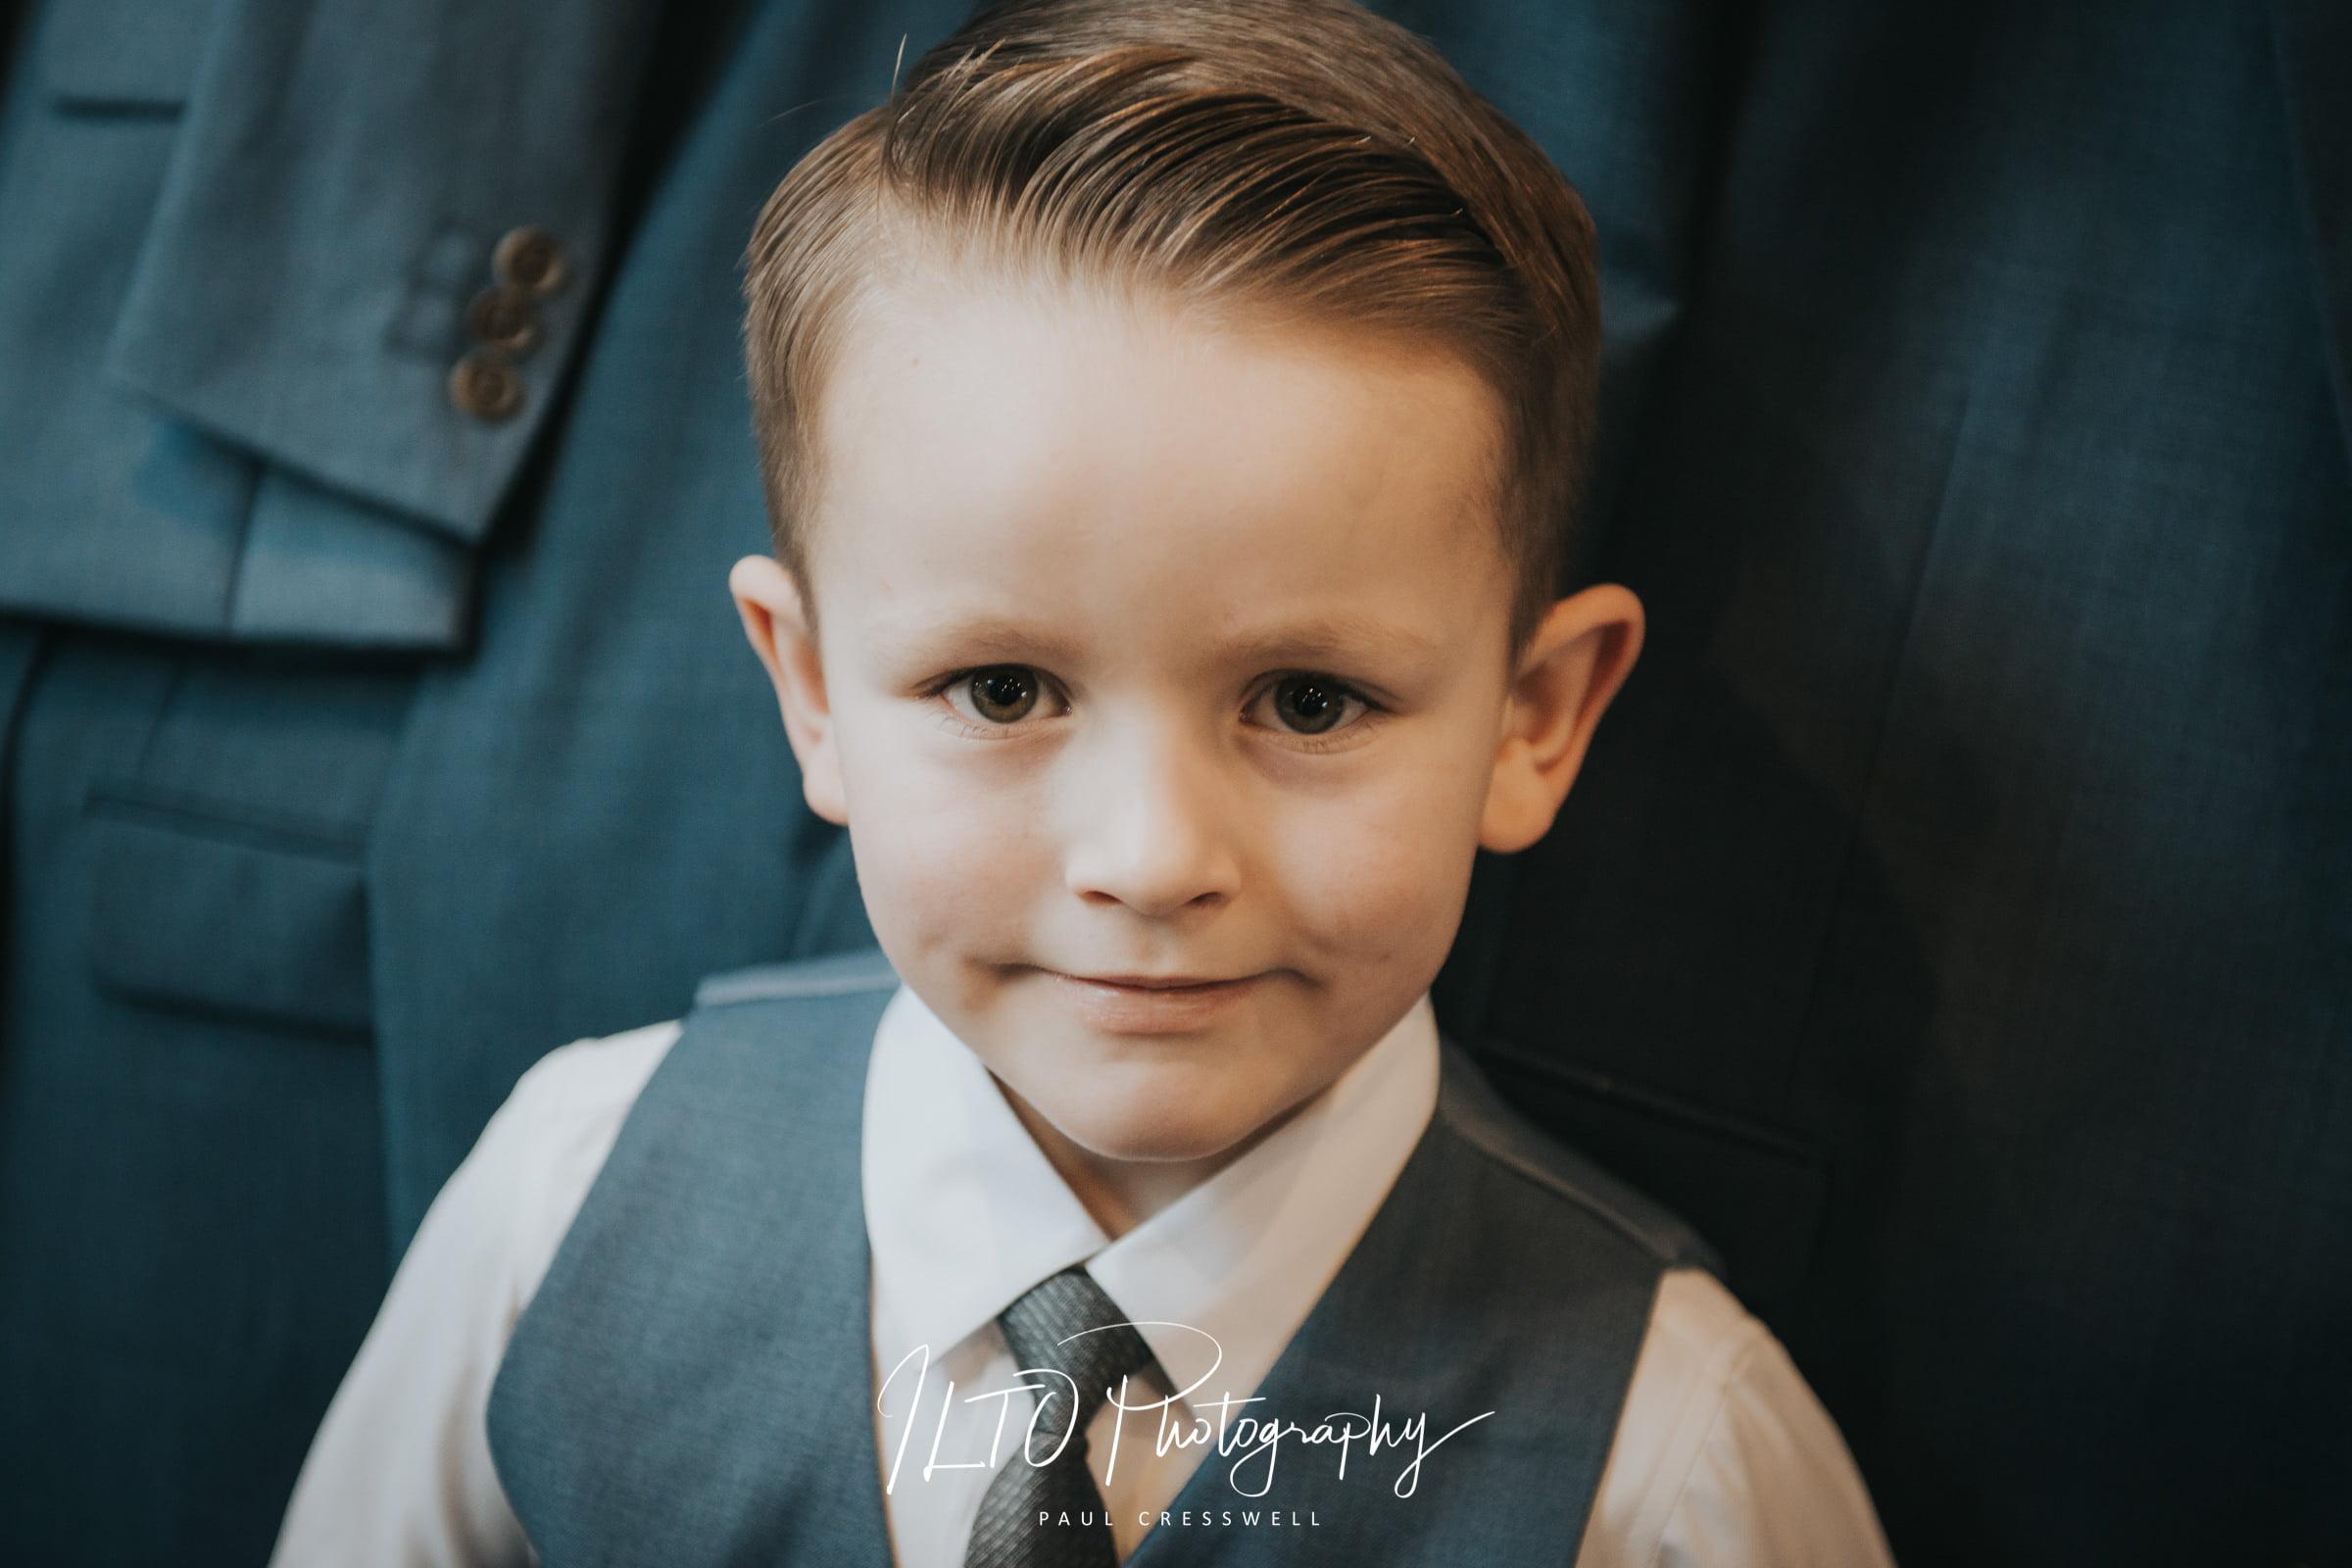 Wedding Portfolio, young boy in a suit